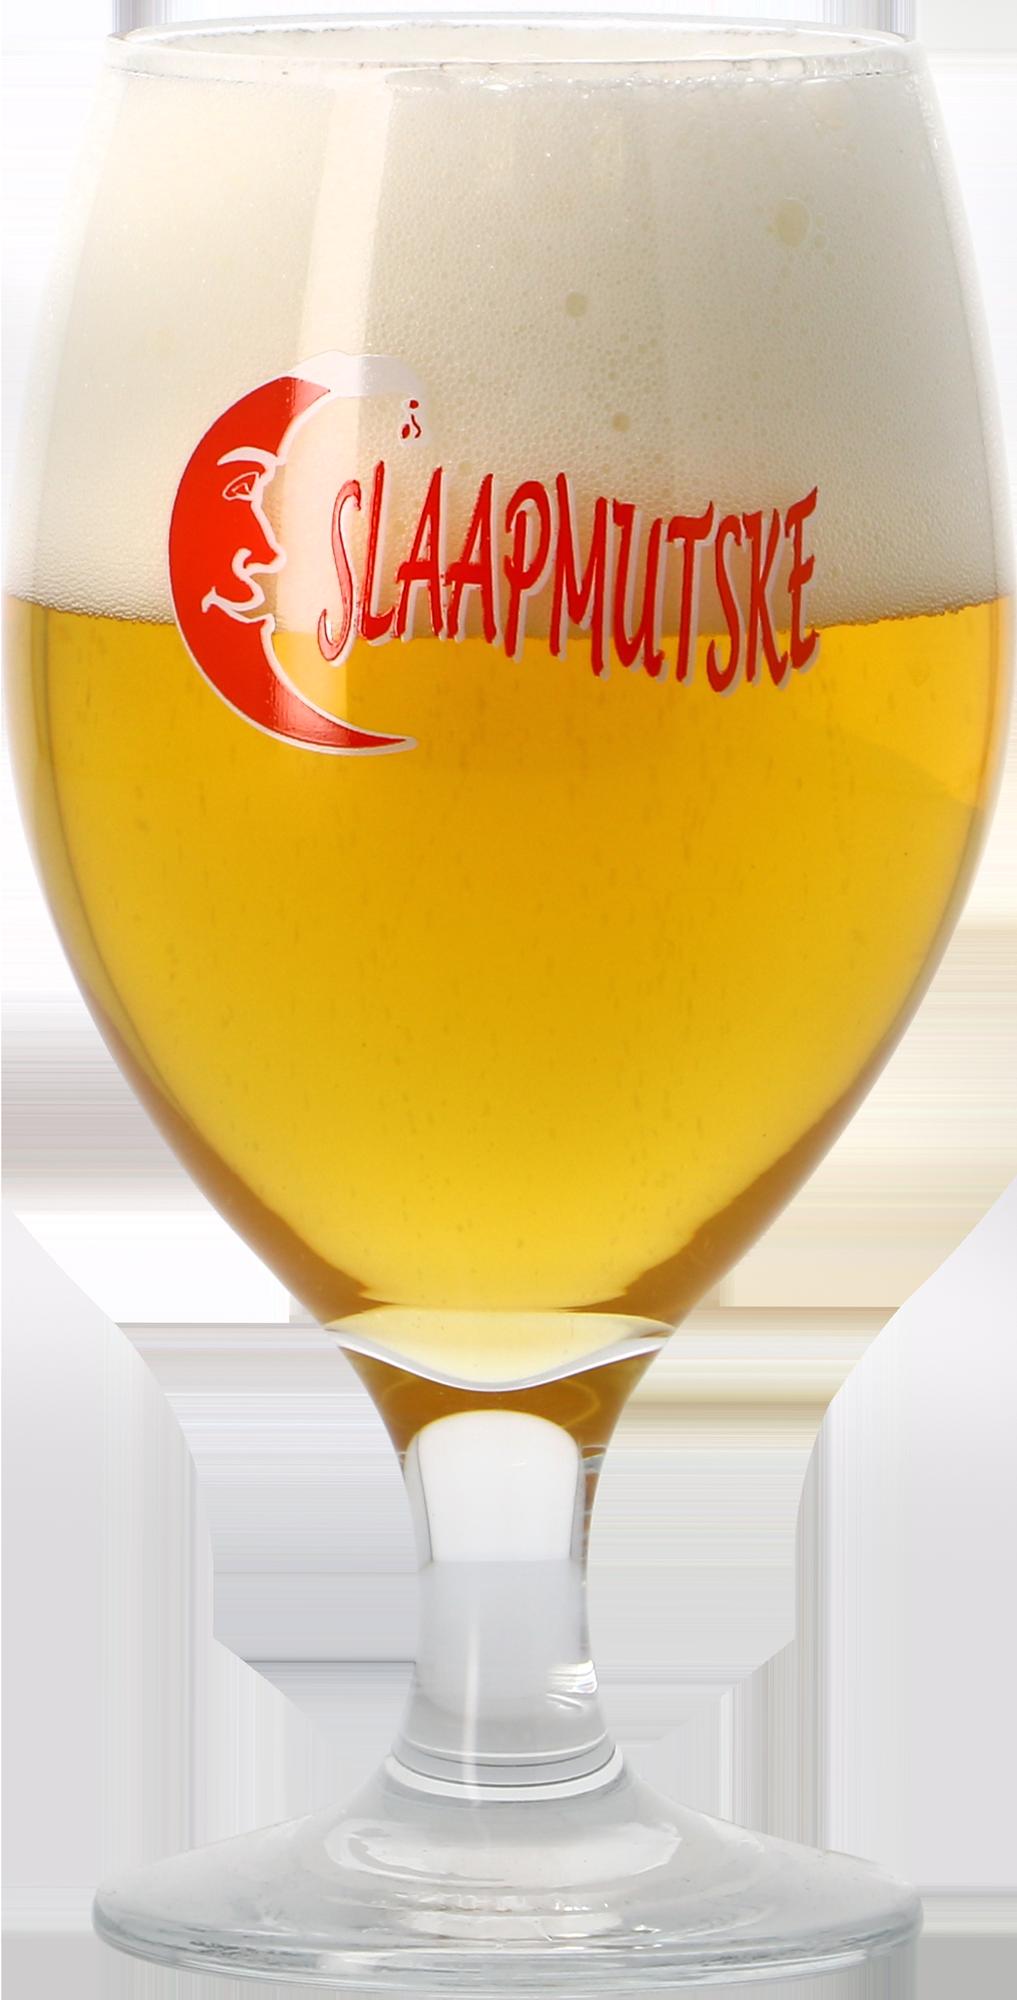 Verre Slaapmutske - 33 cl